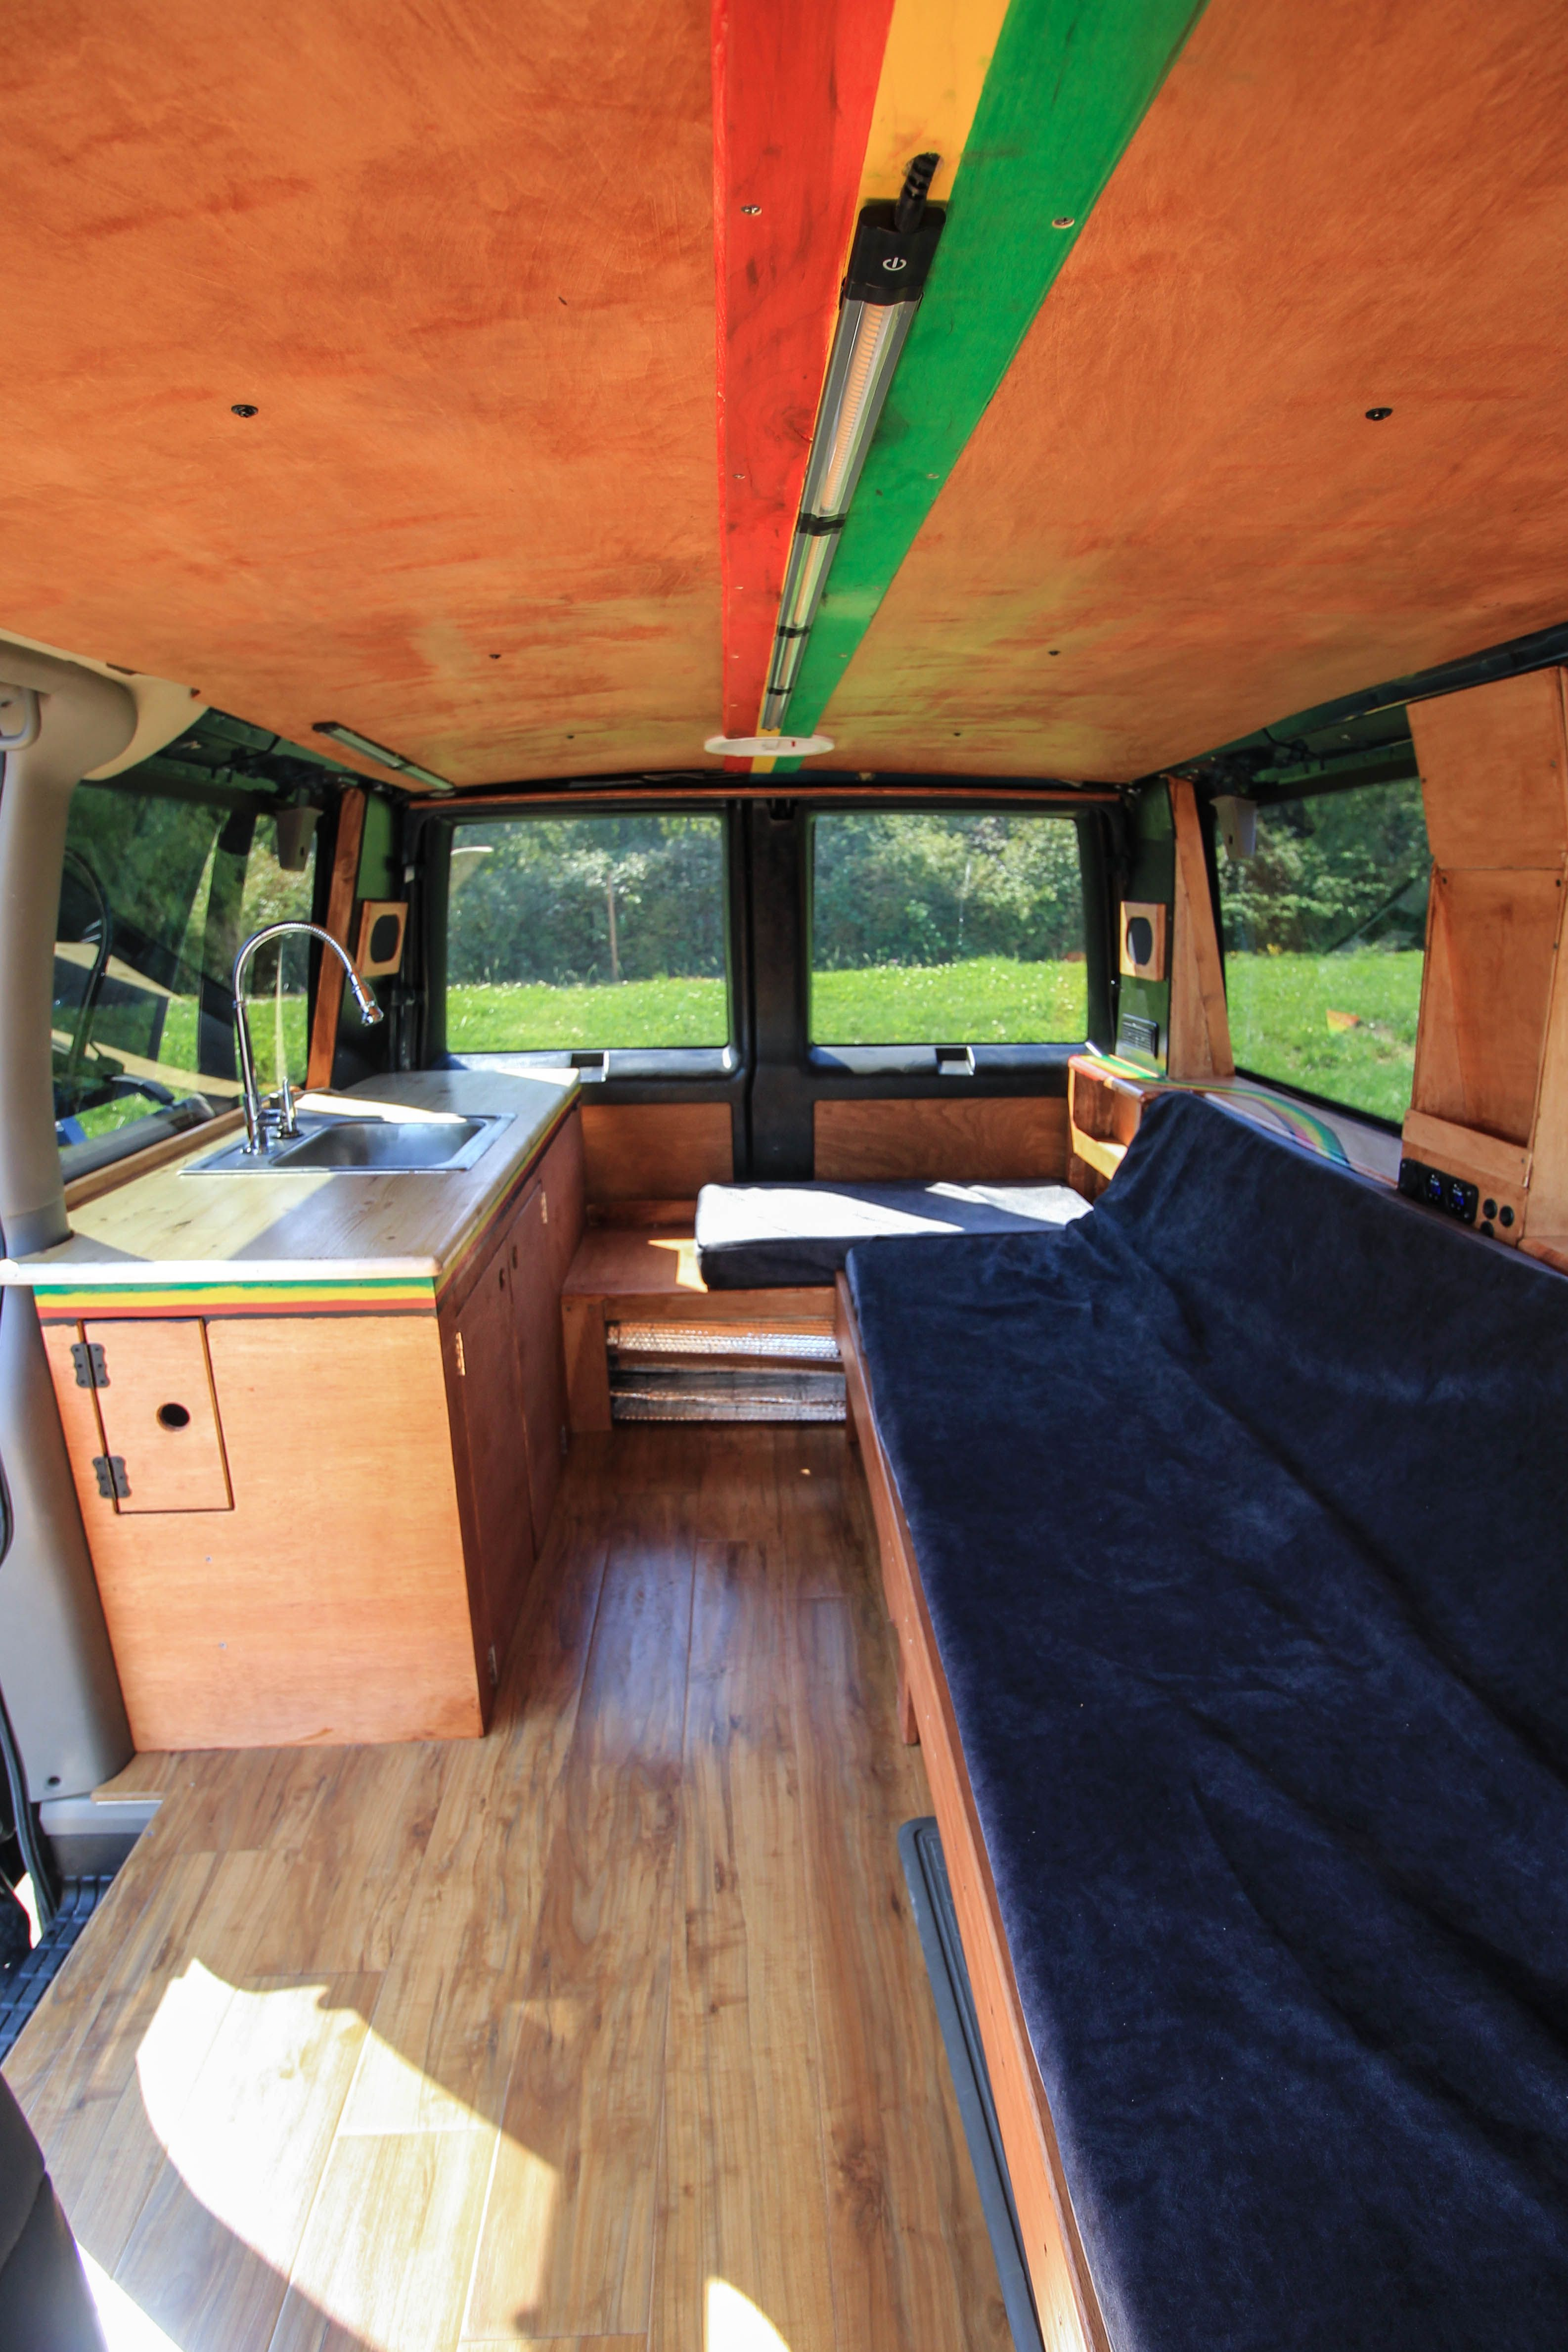 42+ Astro van camper high quality